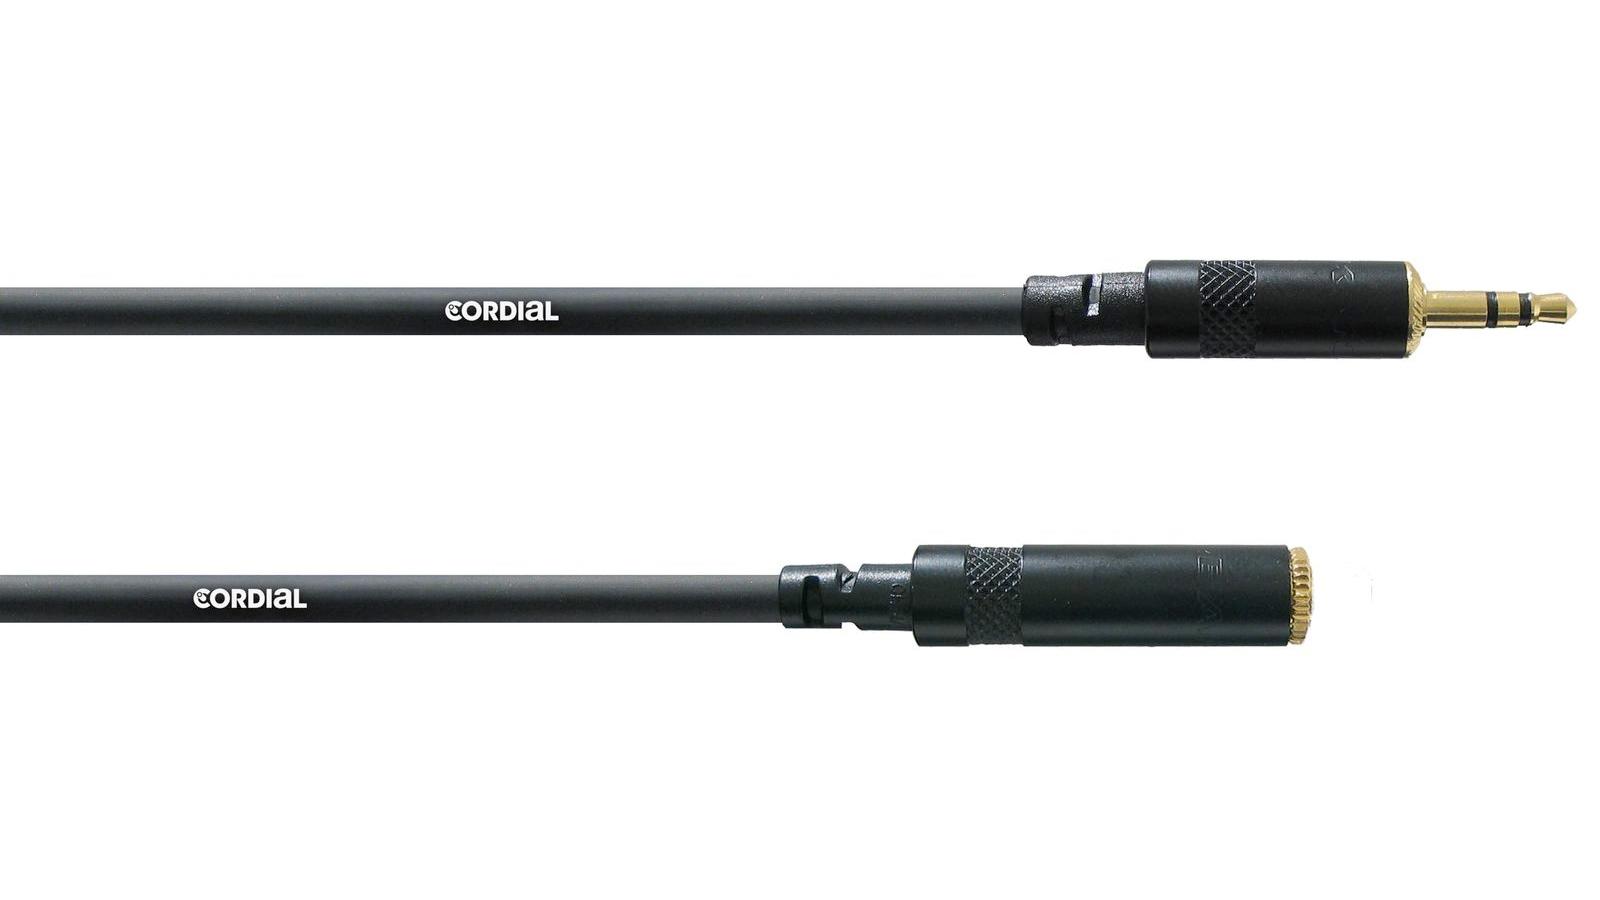 Cordial Verlängerung Mini Klinke 3 m CFS 3 WY